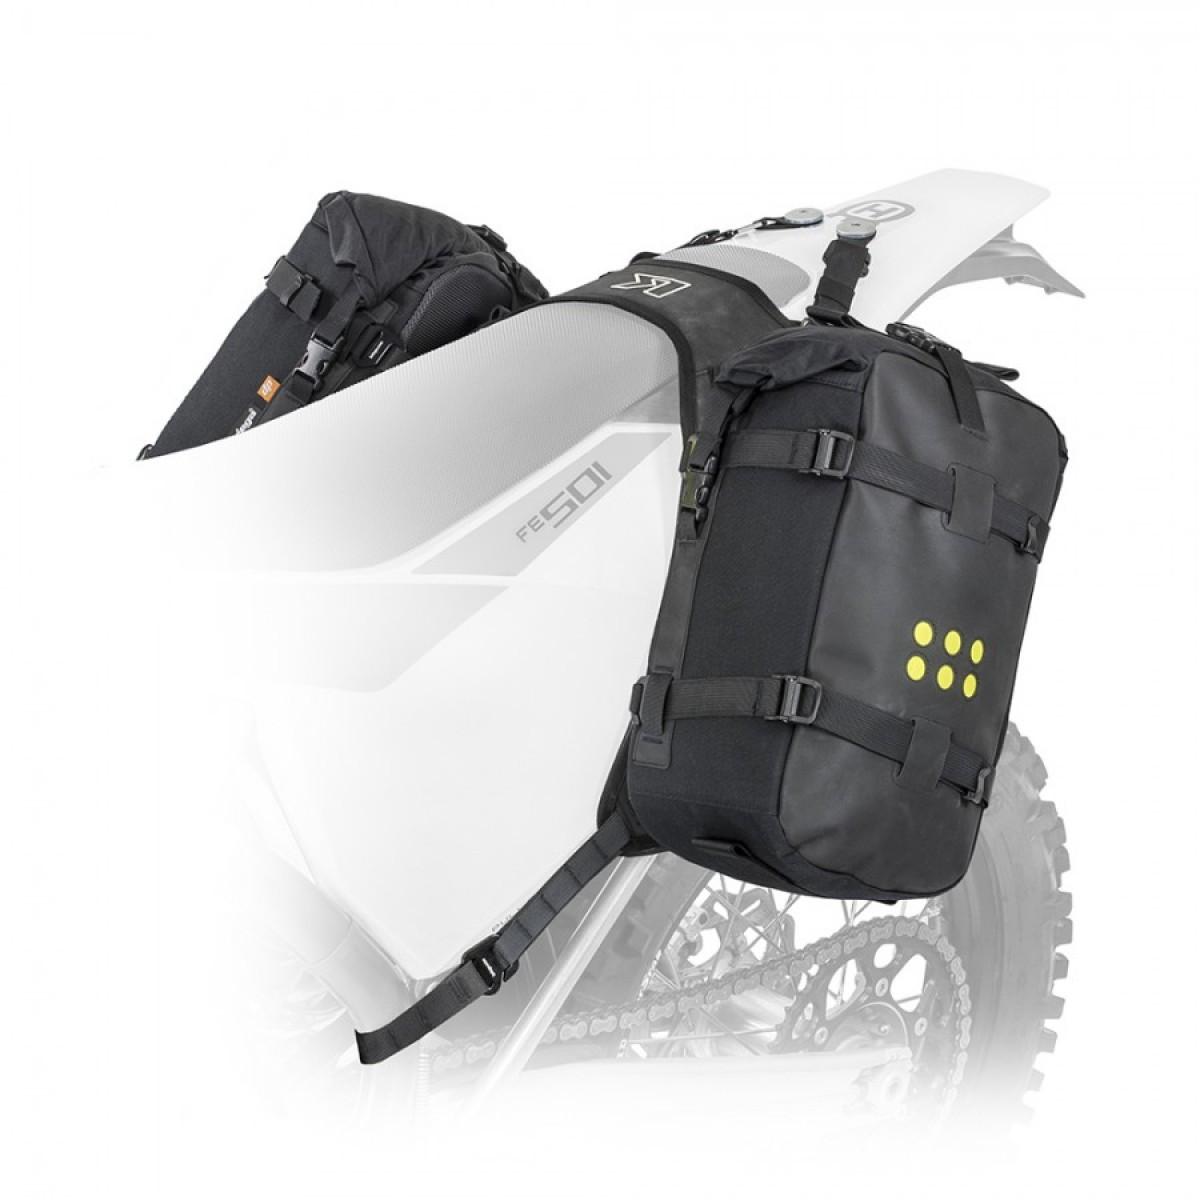 Багажная система KRIEGA OS-COMBO 24 black